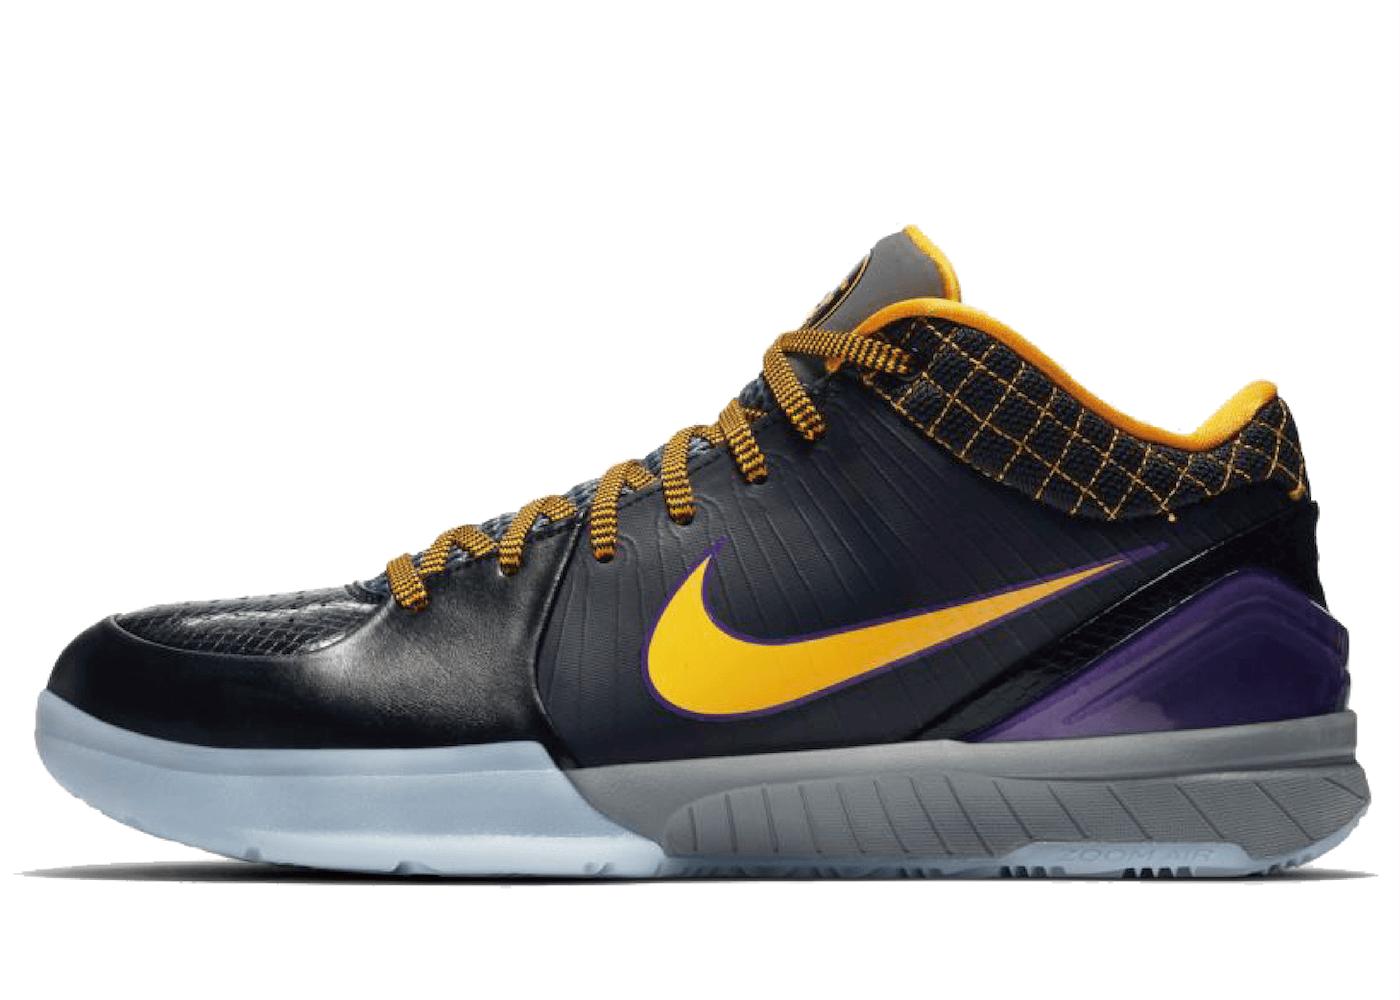 Nike Kobe 4 Protro Carpe Diemの写真